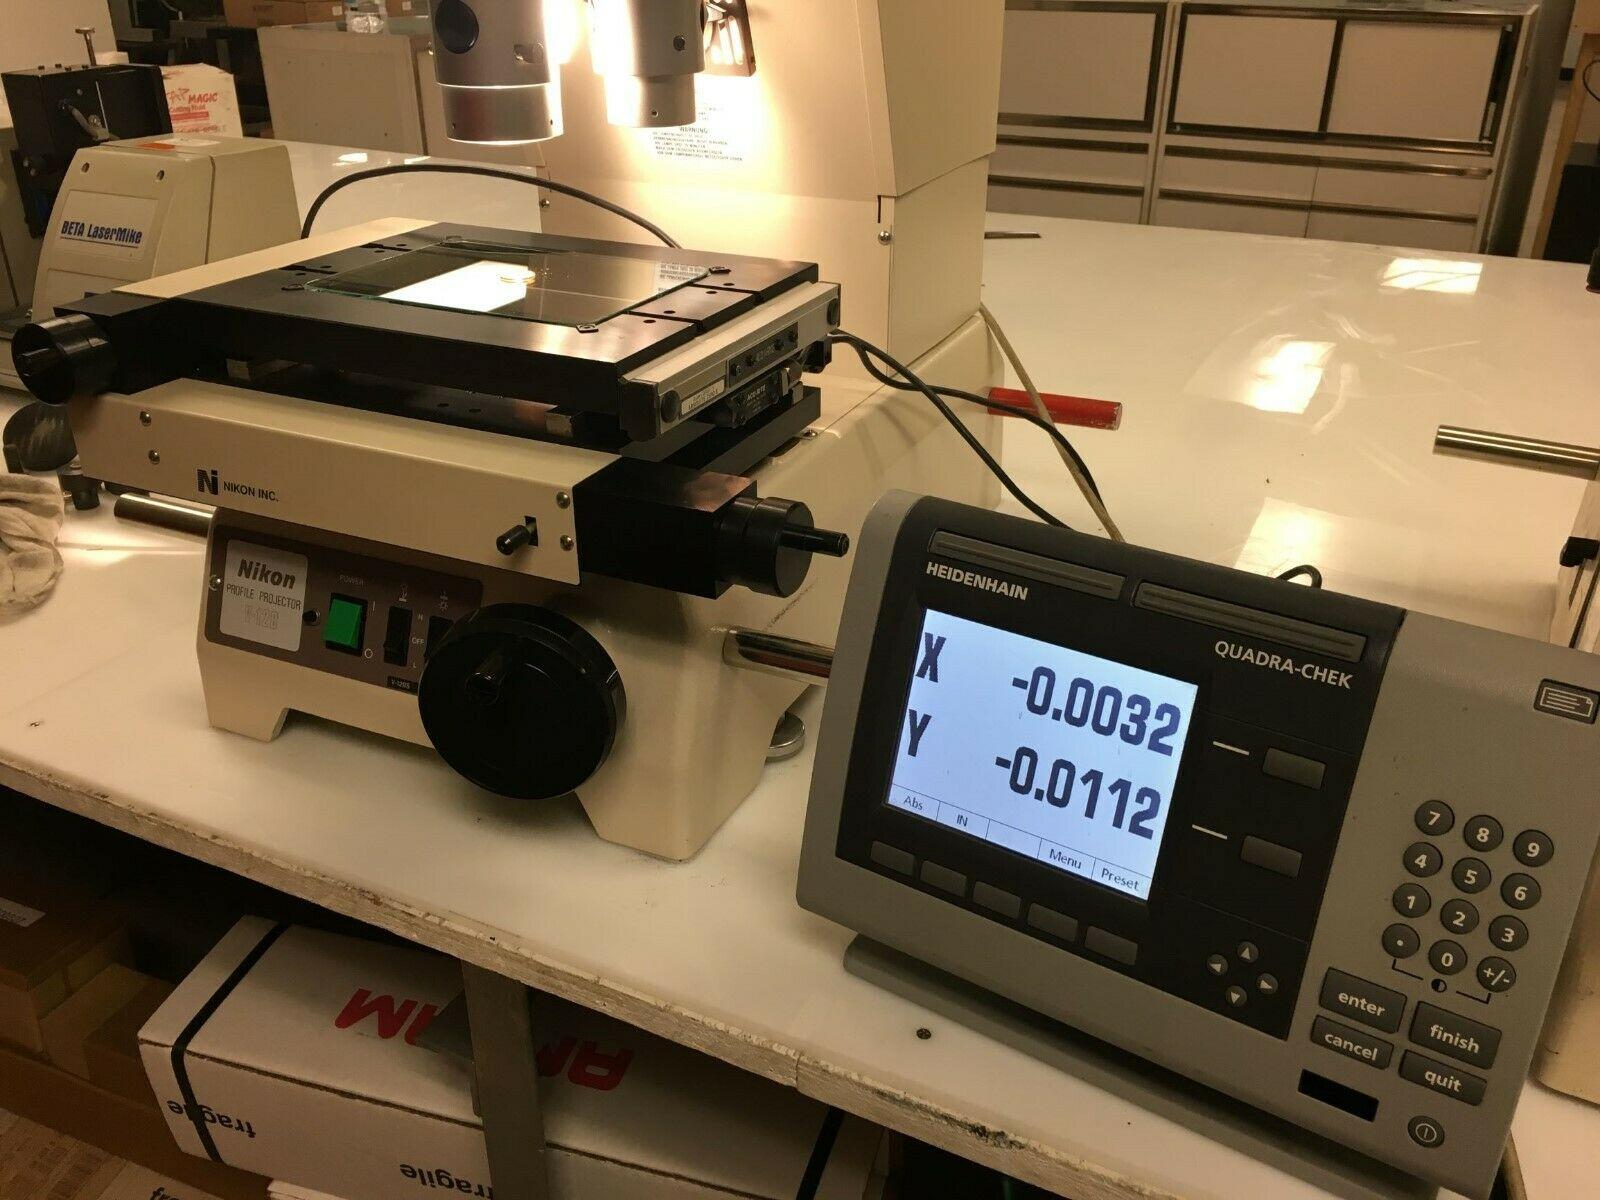 "12"" Nikon Model V-12BS Bench Top Comparator / Profile Projector, S/N 1300028."